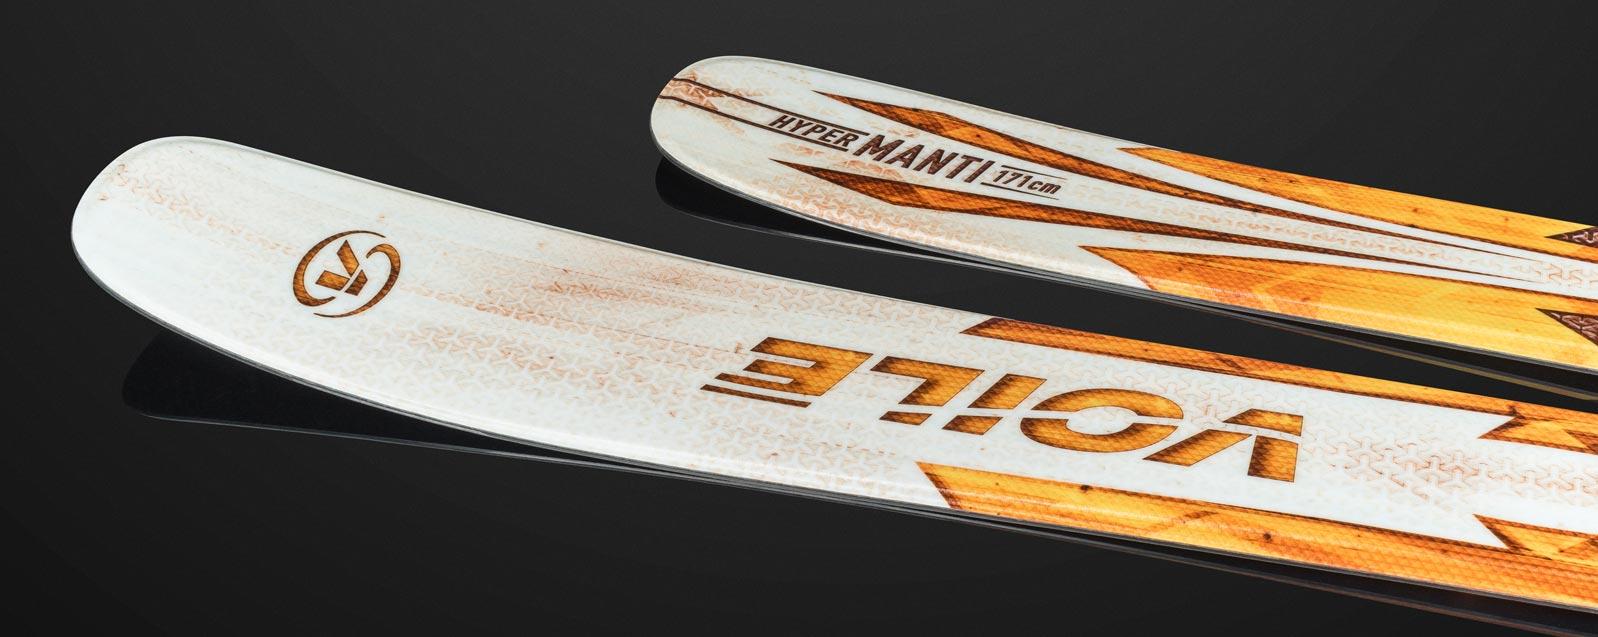 Voile Hyper Manti Skis